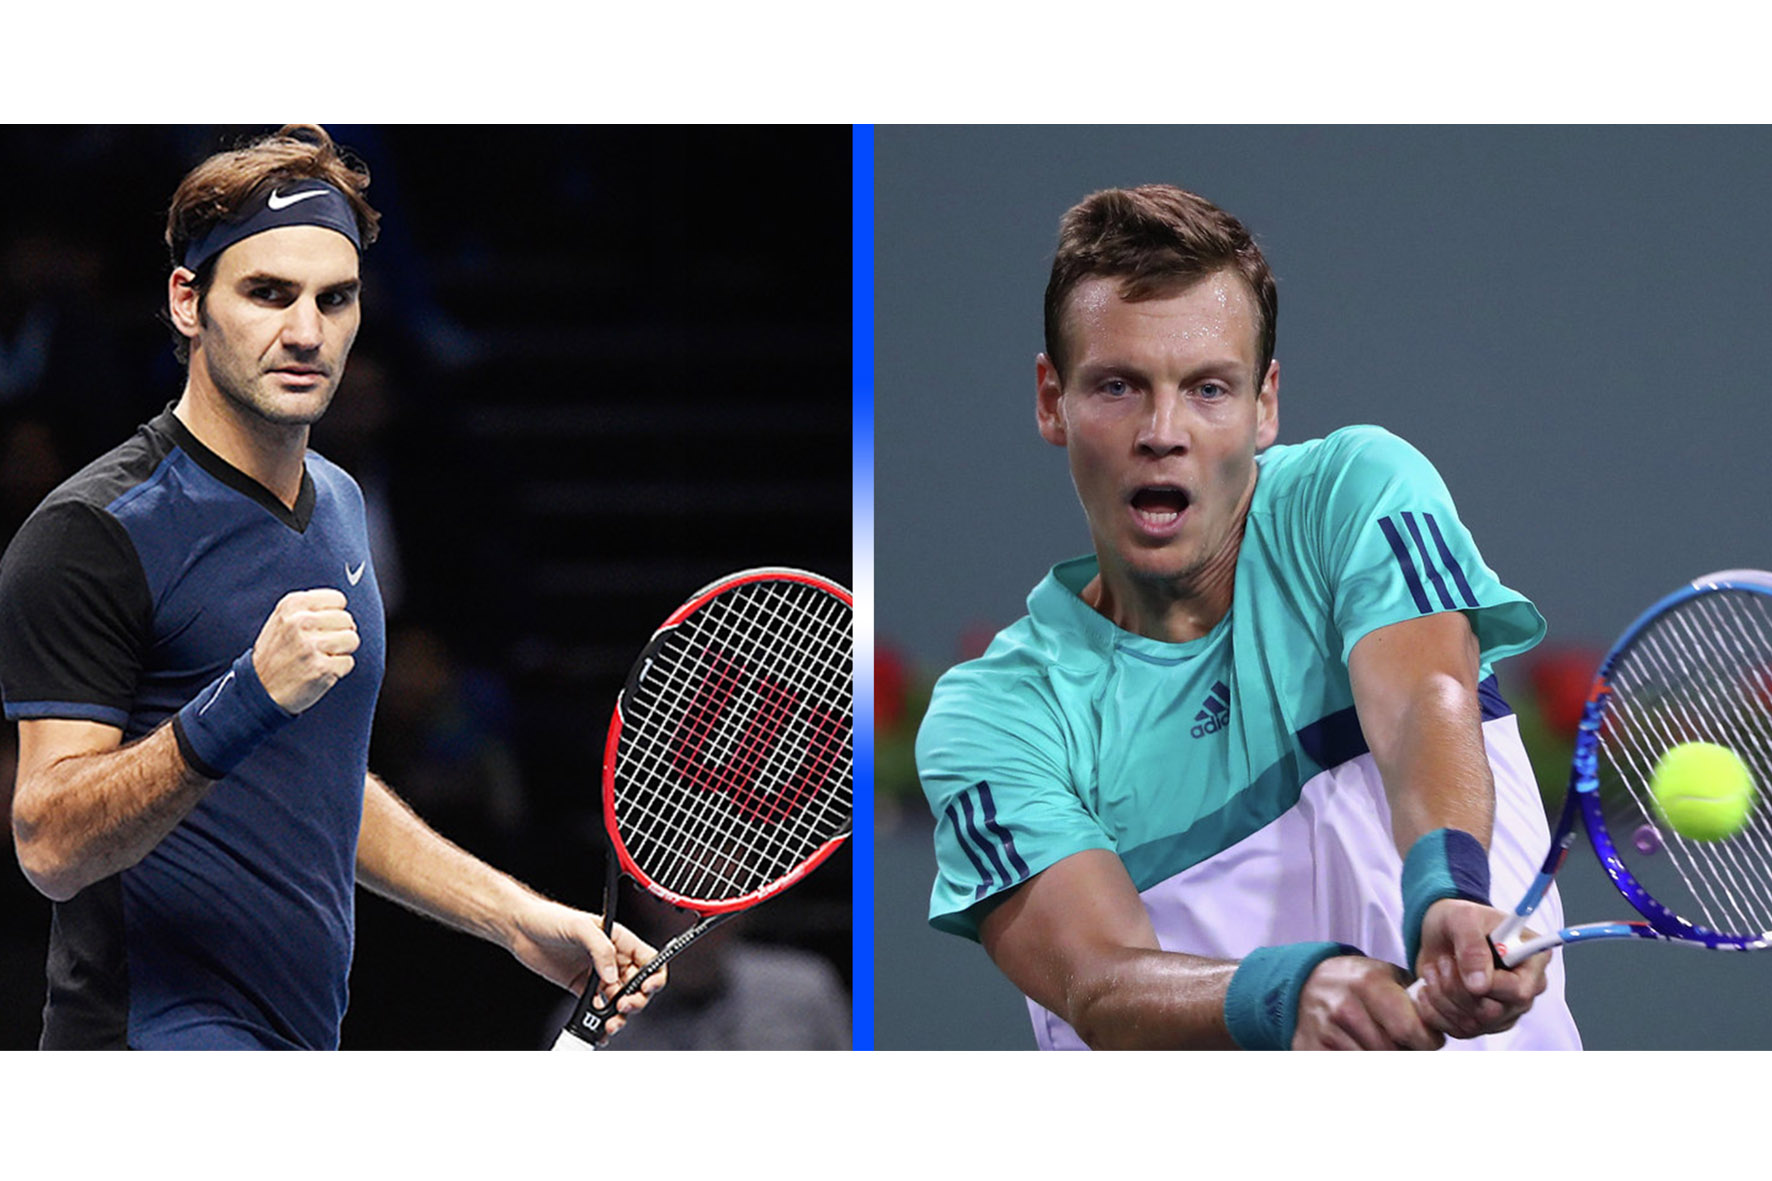 Прогноз на матч Федерер - Бердых ATP Masters Miami 30 марта 2017